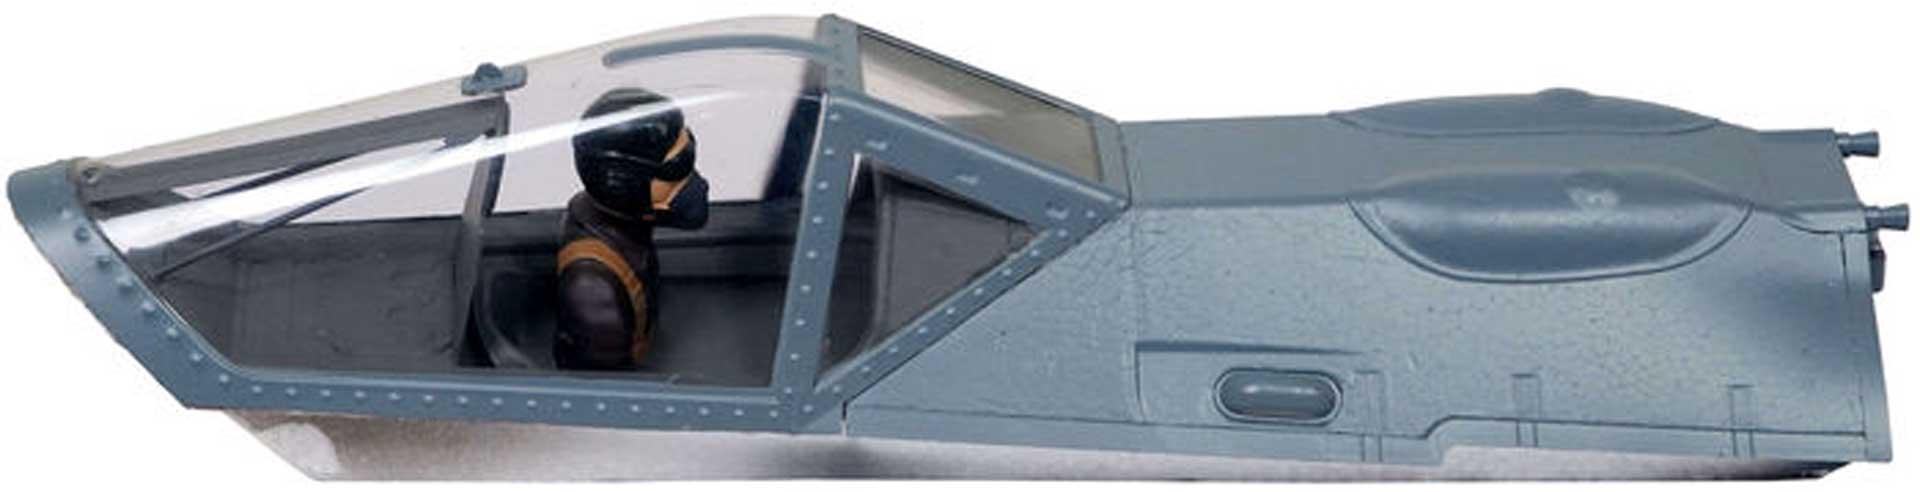 E-Flite Canopy w/Pilot; Focke-Wulf Fw190A 1.5m